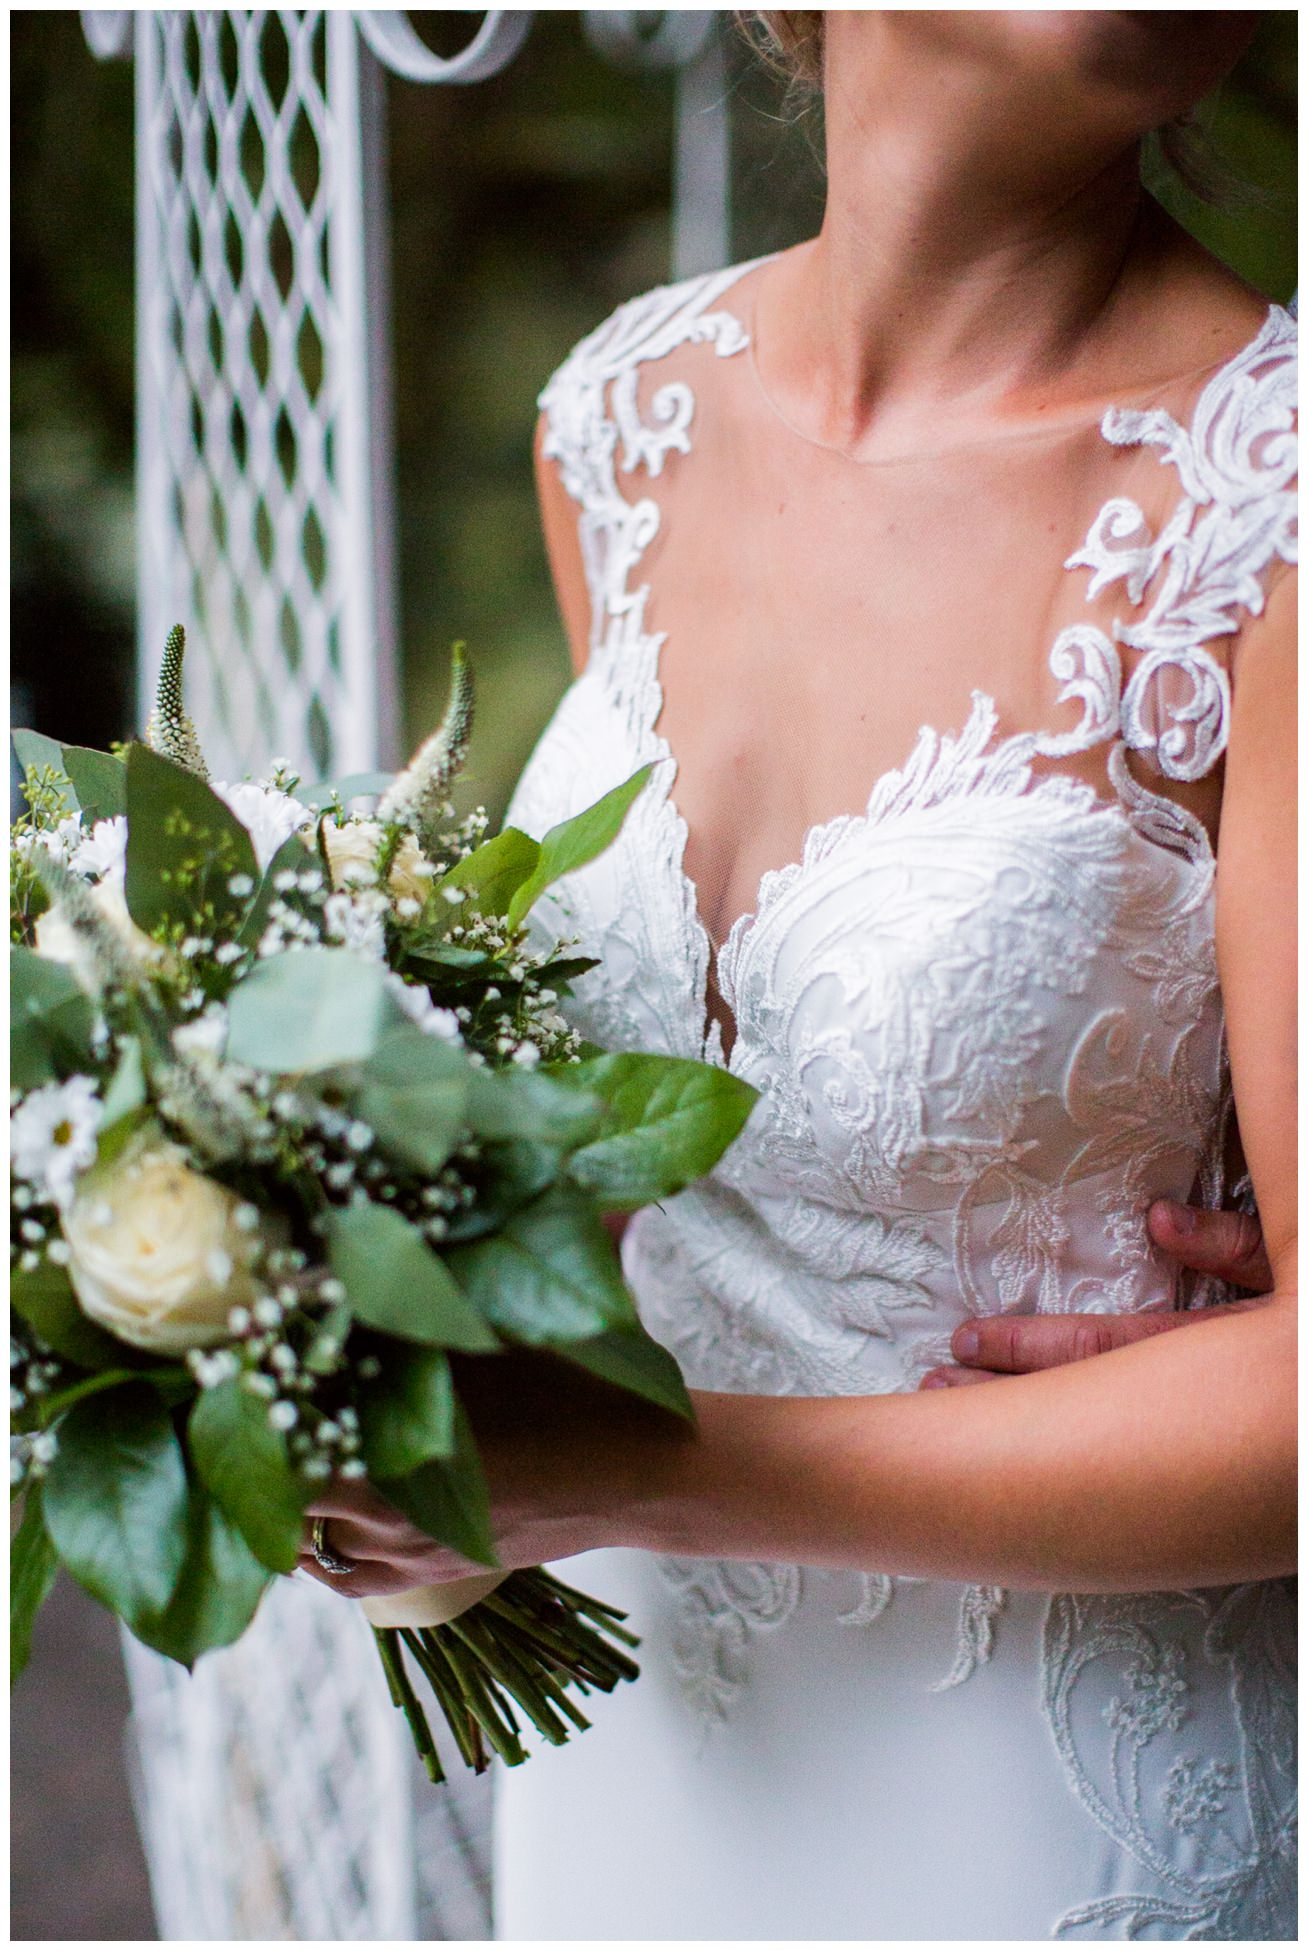 Innishannon house wedding, west cork wedding, cork wedding photographer, vintage theme wedding